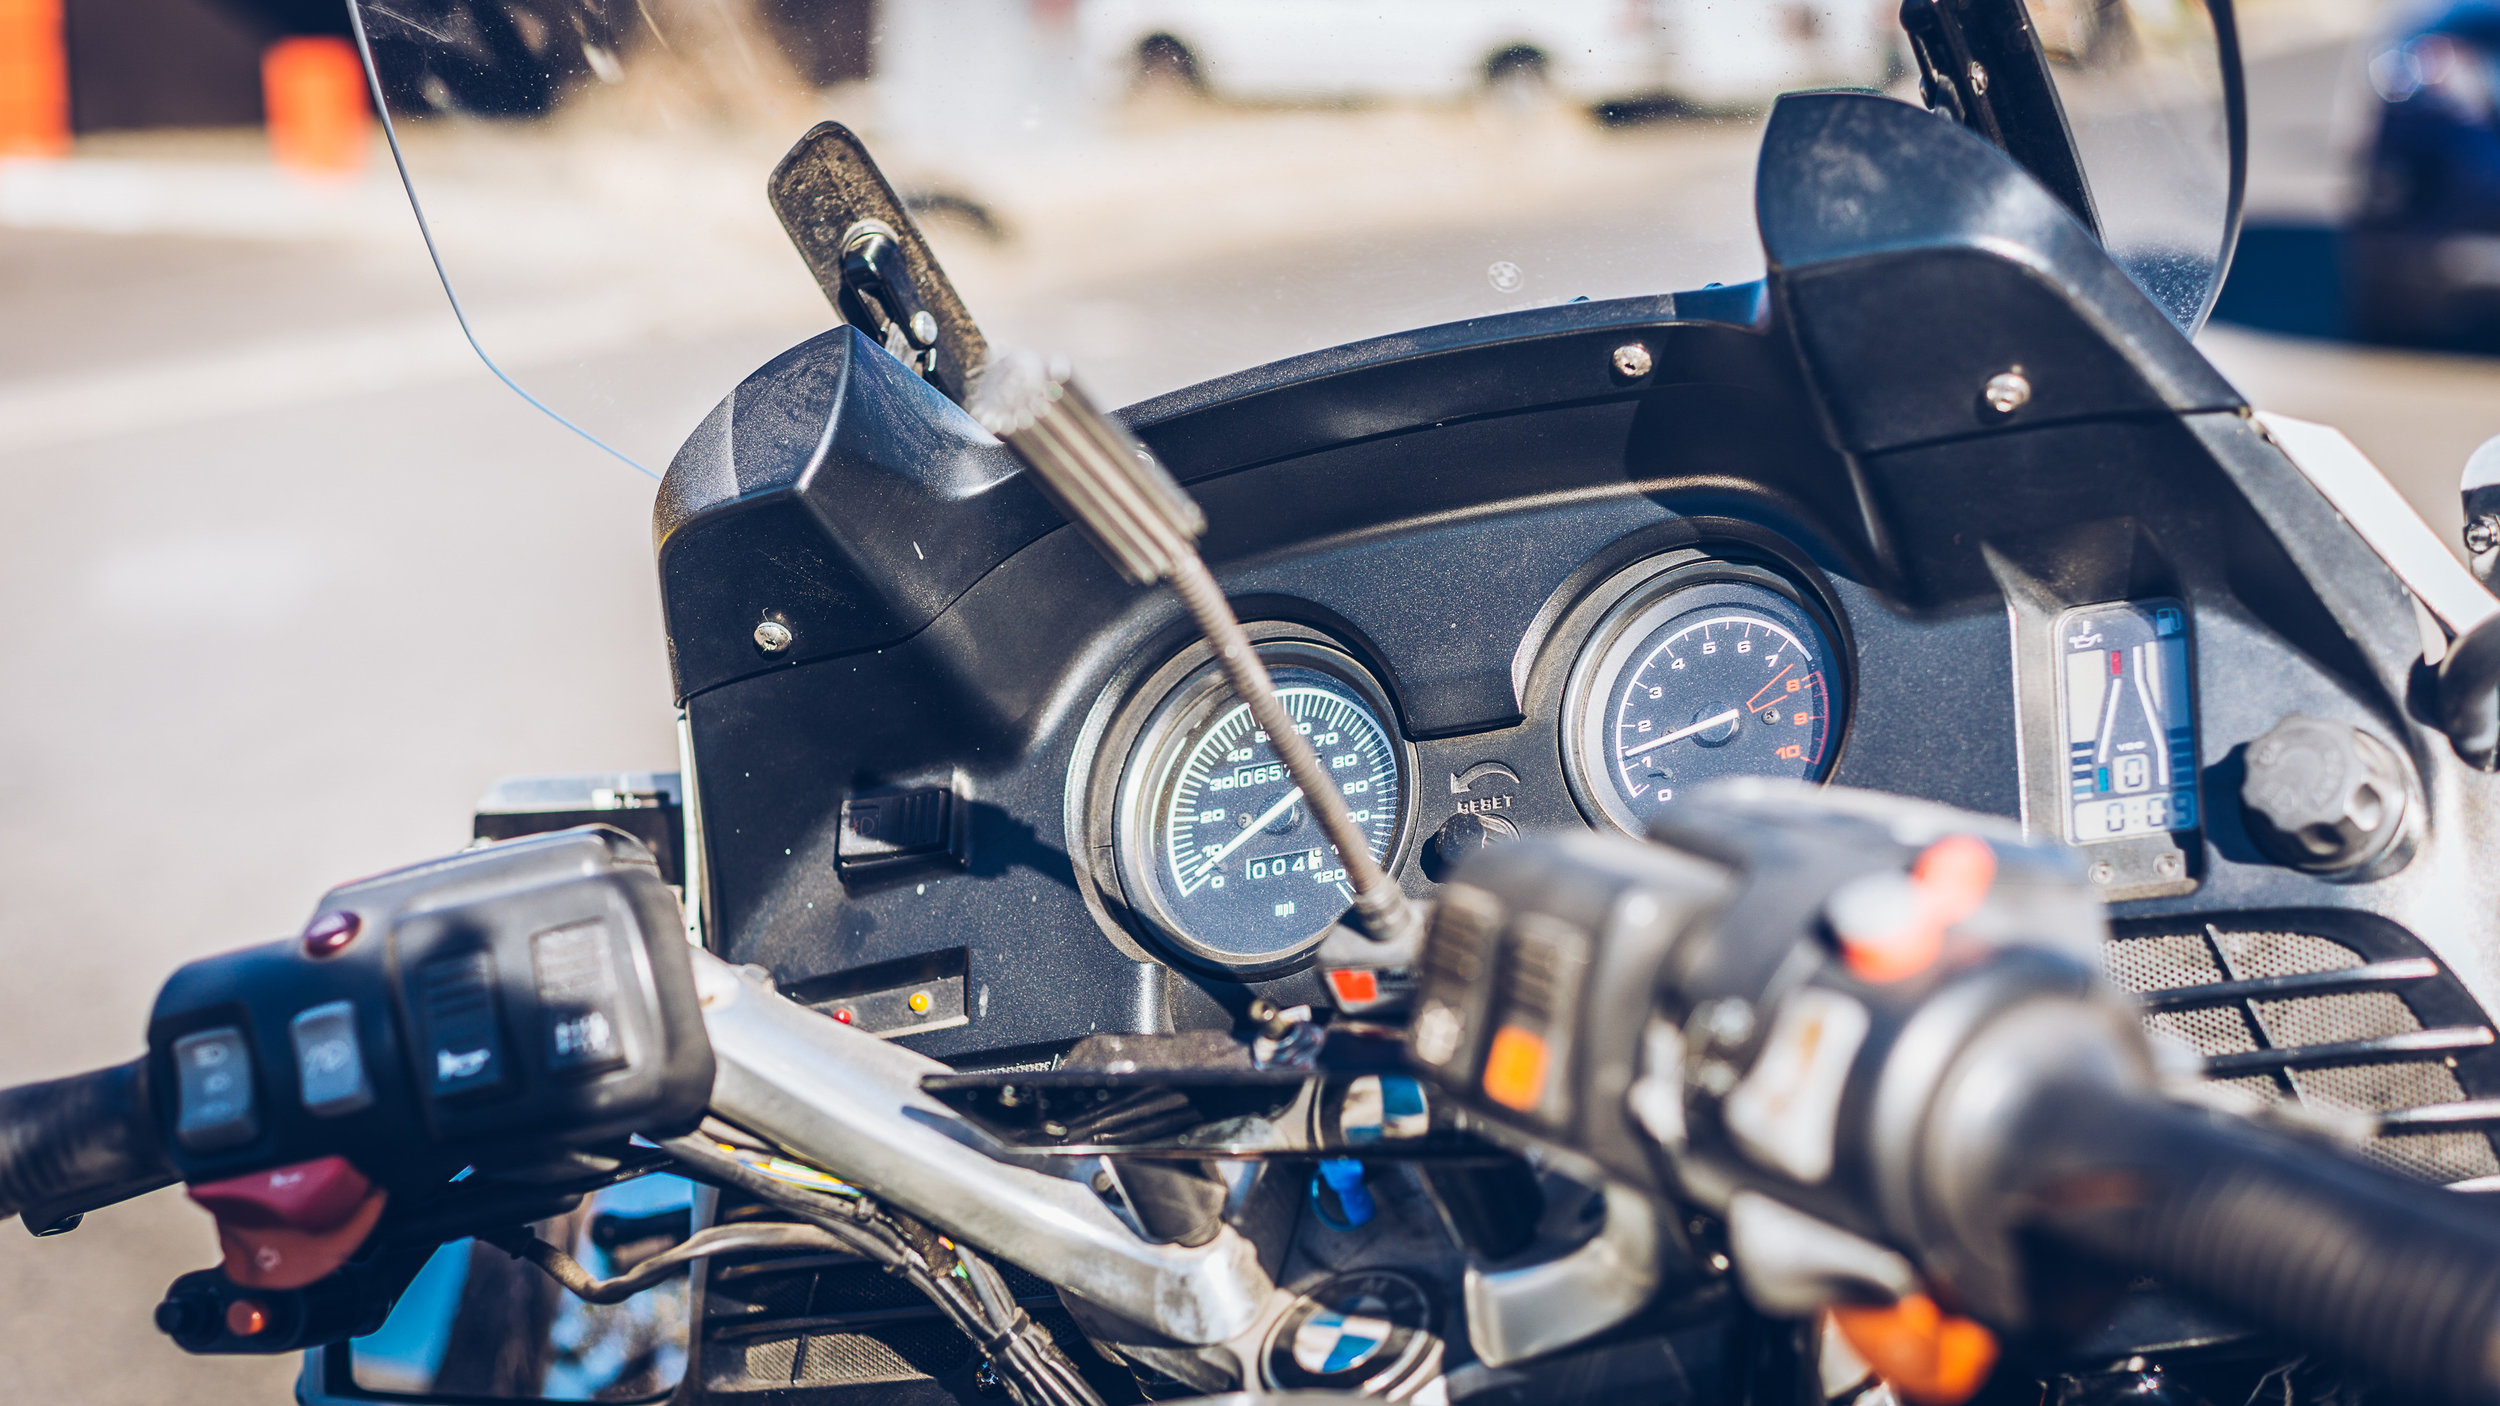 bmw police bikes 6 jpg [ 2500 x 1406 Pixel ]